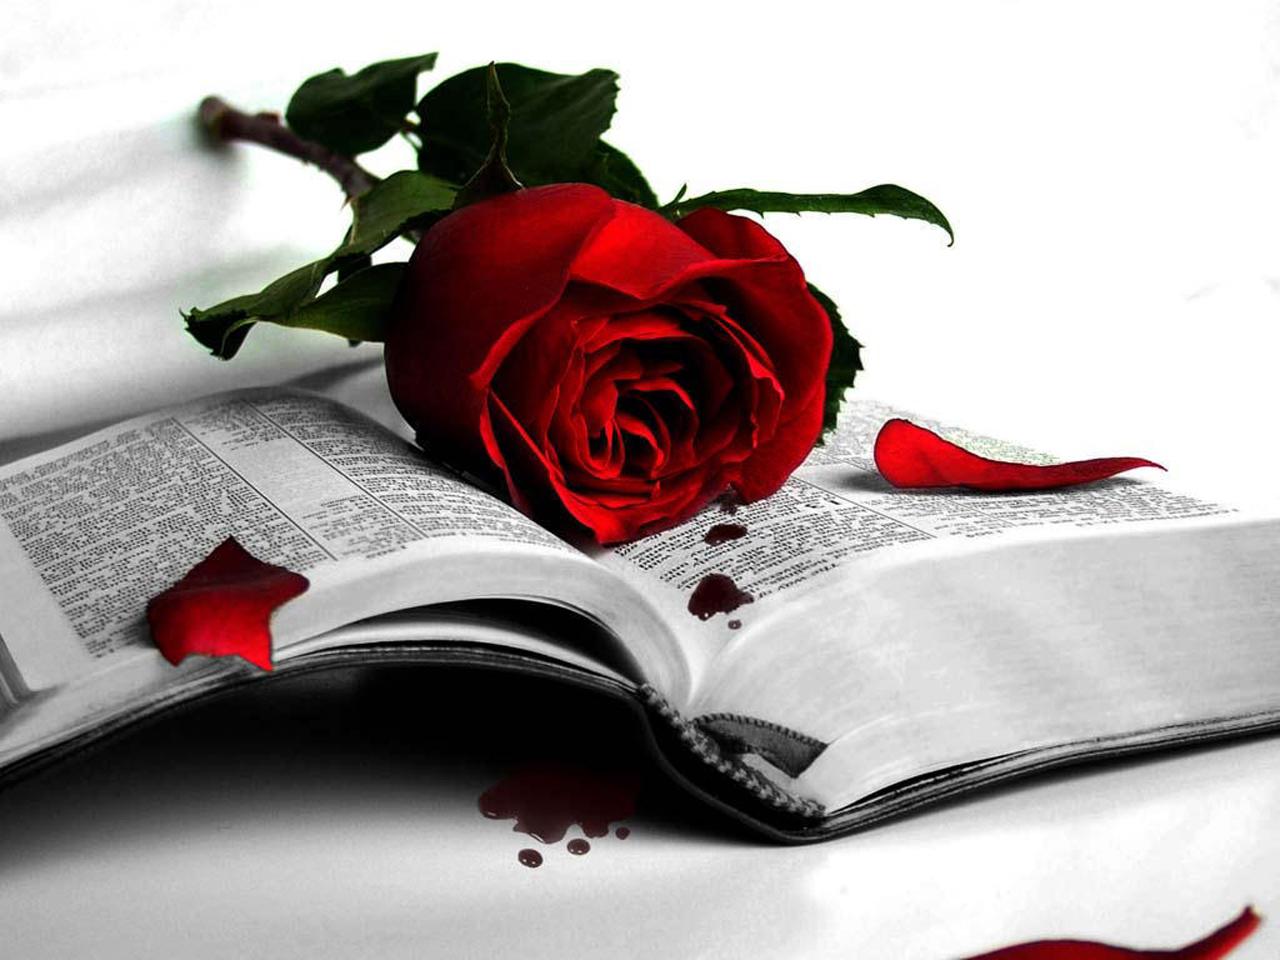 http://3.bp.blogspot.com/-W-zubjKuaQ4/UBusPri8KnI/AAAAAAAAAOw/aDx5jS68Wq0/s1600/red+rose+(7).jpg